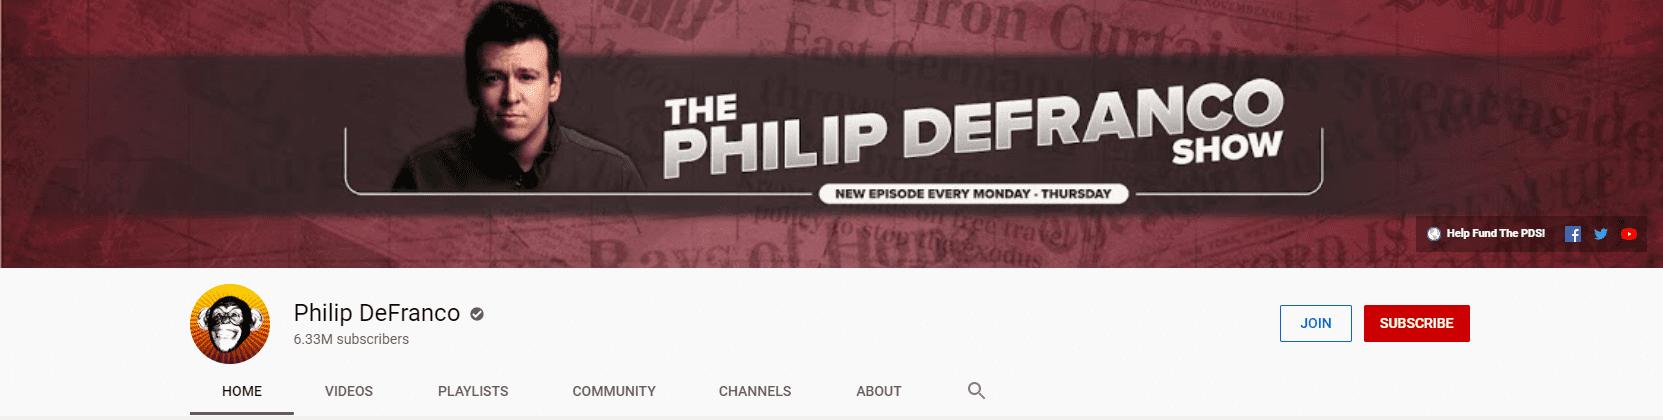 top millennial influencer philip defranco